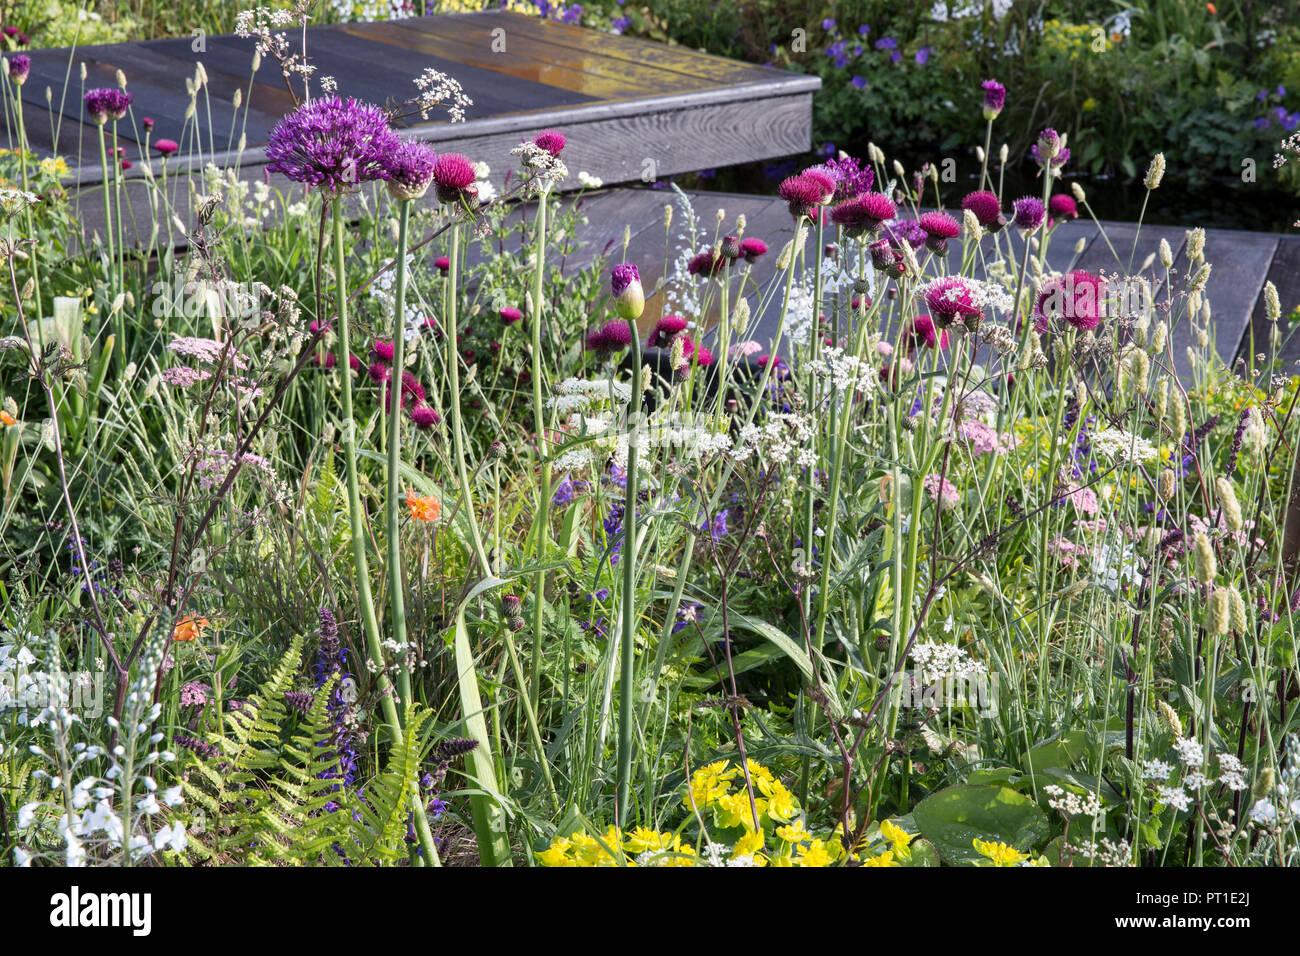 Dark wood deck boardwalk, Meadow style planting of Allium hollandicum 'Purple Sensation', Cirsium rivulare 'Atropurpureum', Myrrhis odorata, Euphorbia - Stock Image